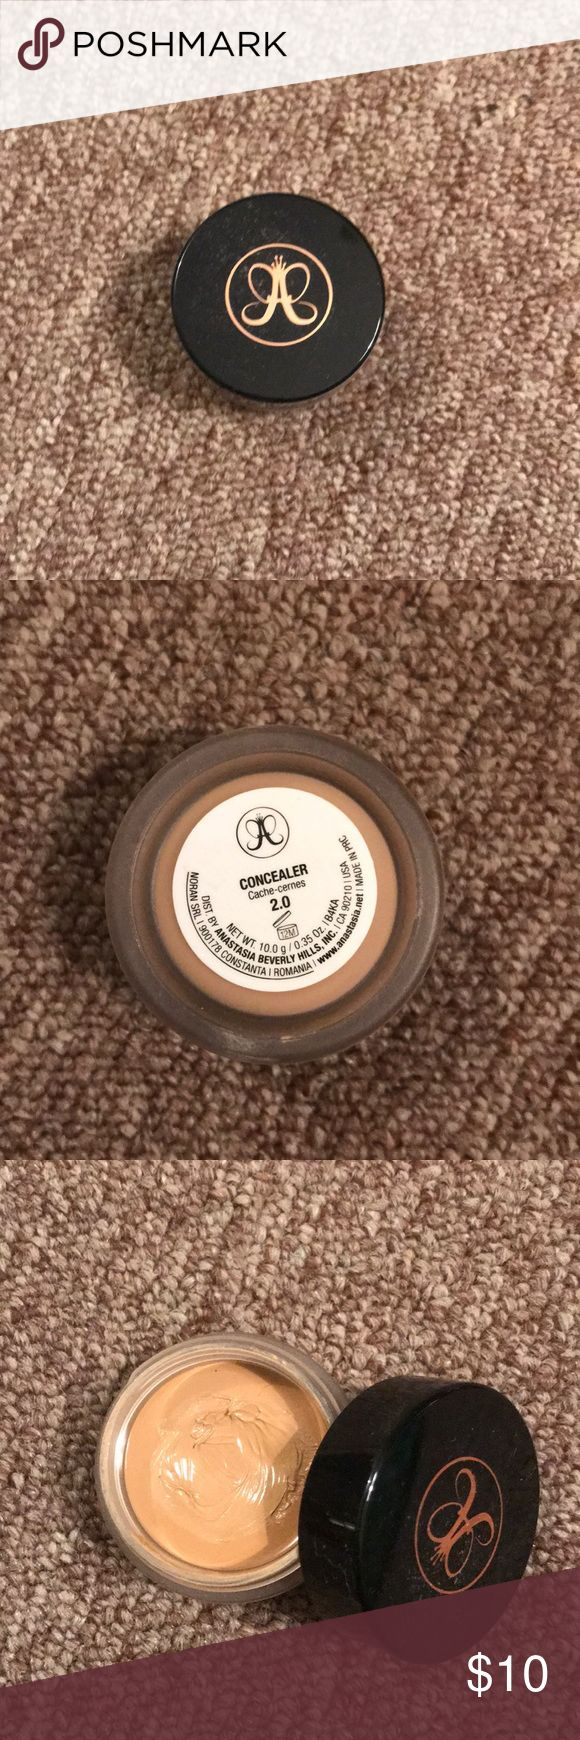 Gently used Anastasia Beverly Hills concealer. Shade 2.0 Anastasia Beverly Hills Makeup Concealer